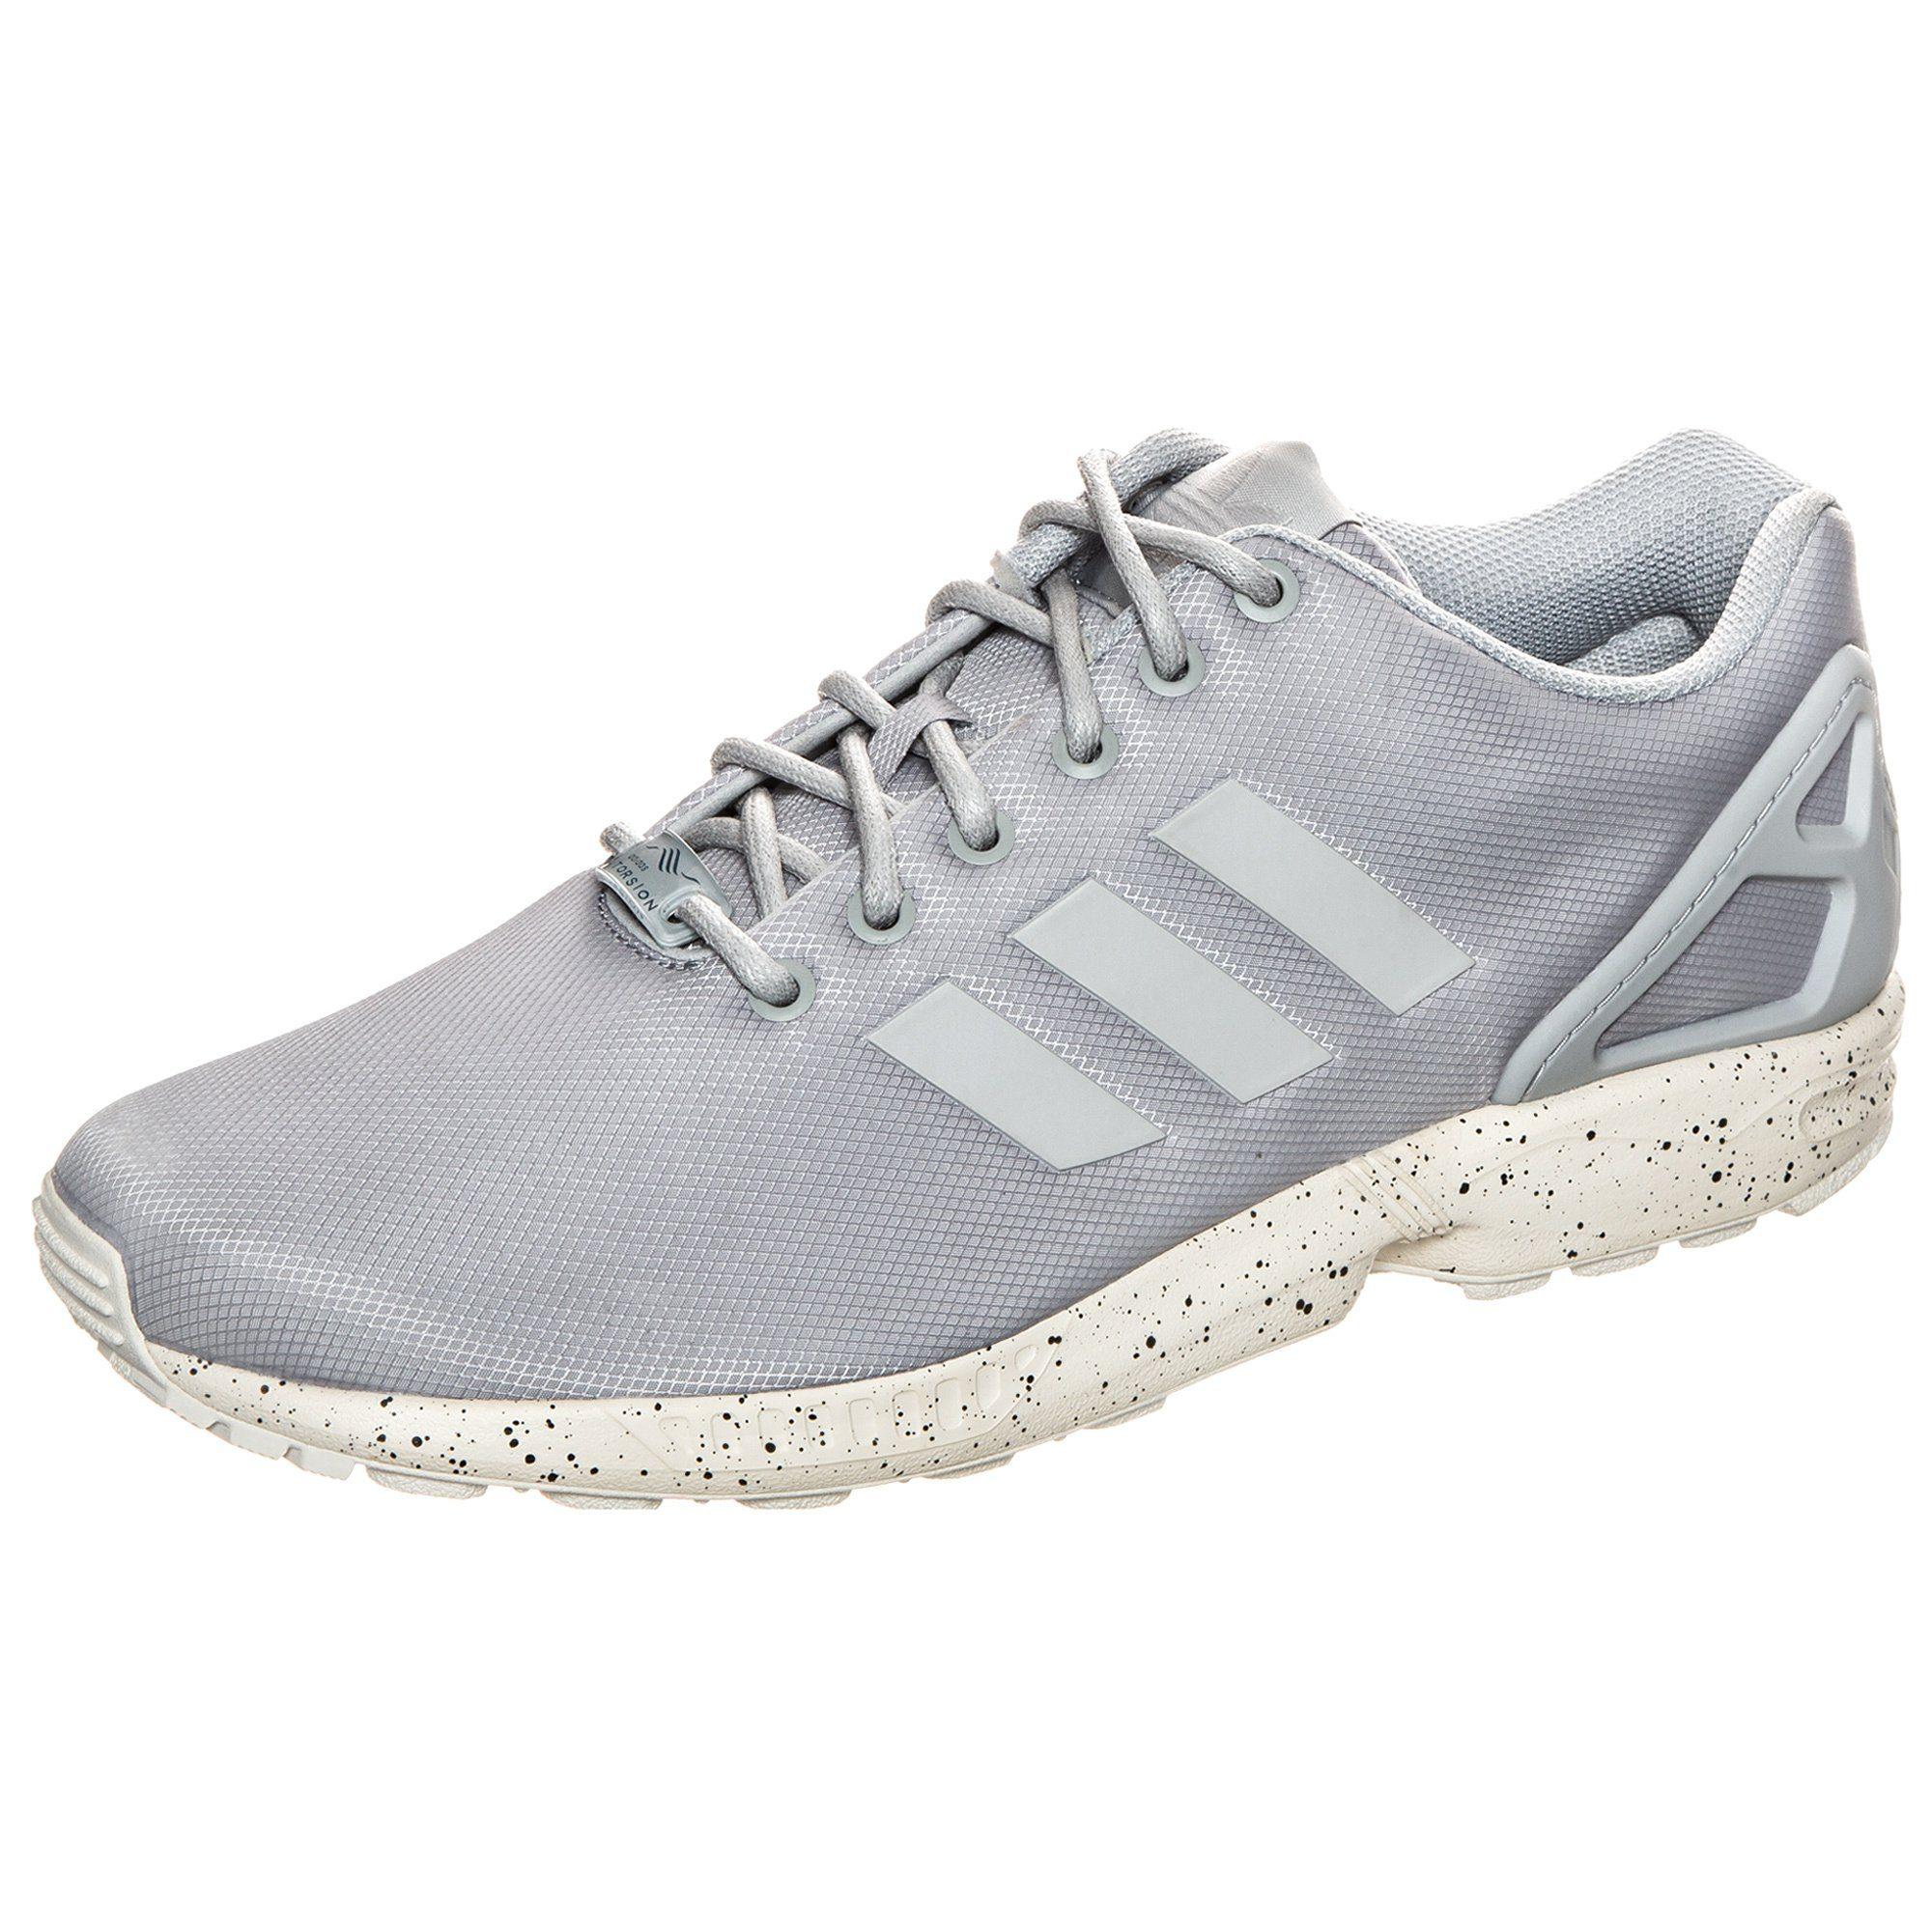 adidas Originals ZX Flux Sneaker Herren kaufen  grau #ft5_slash# beige